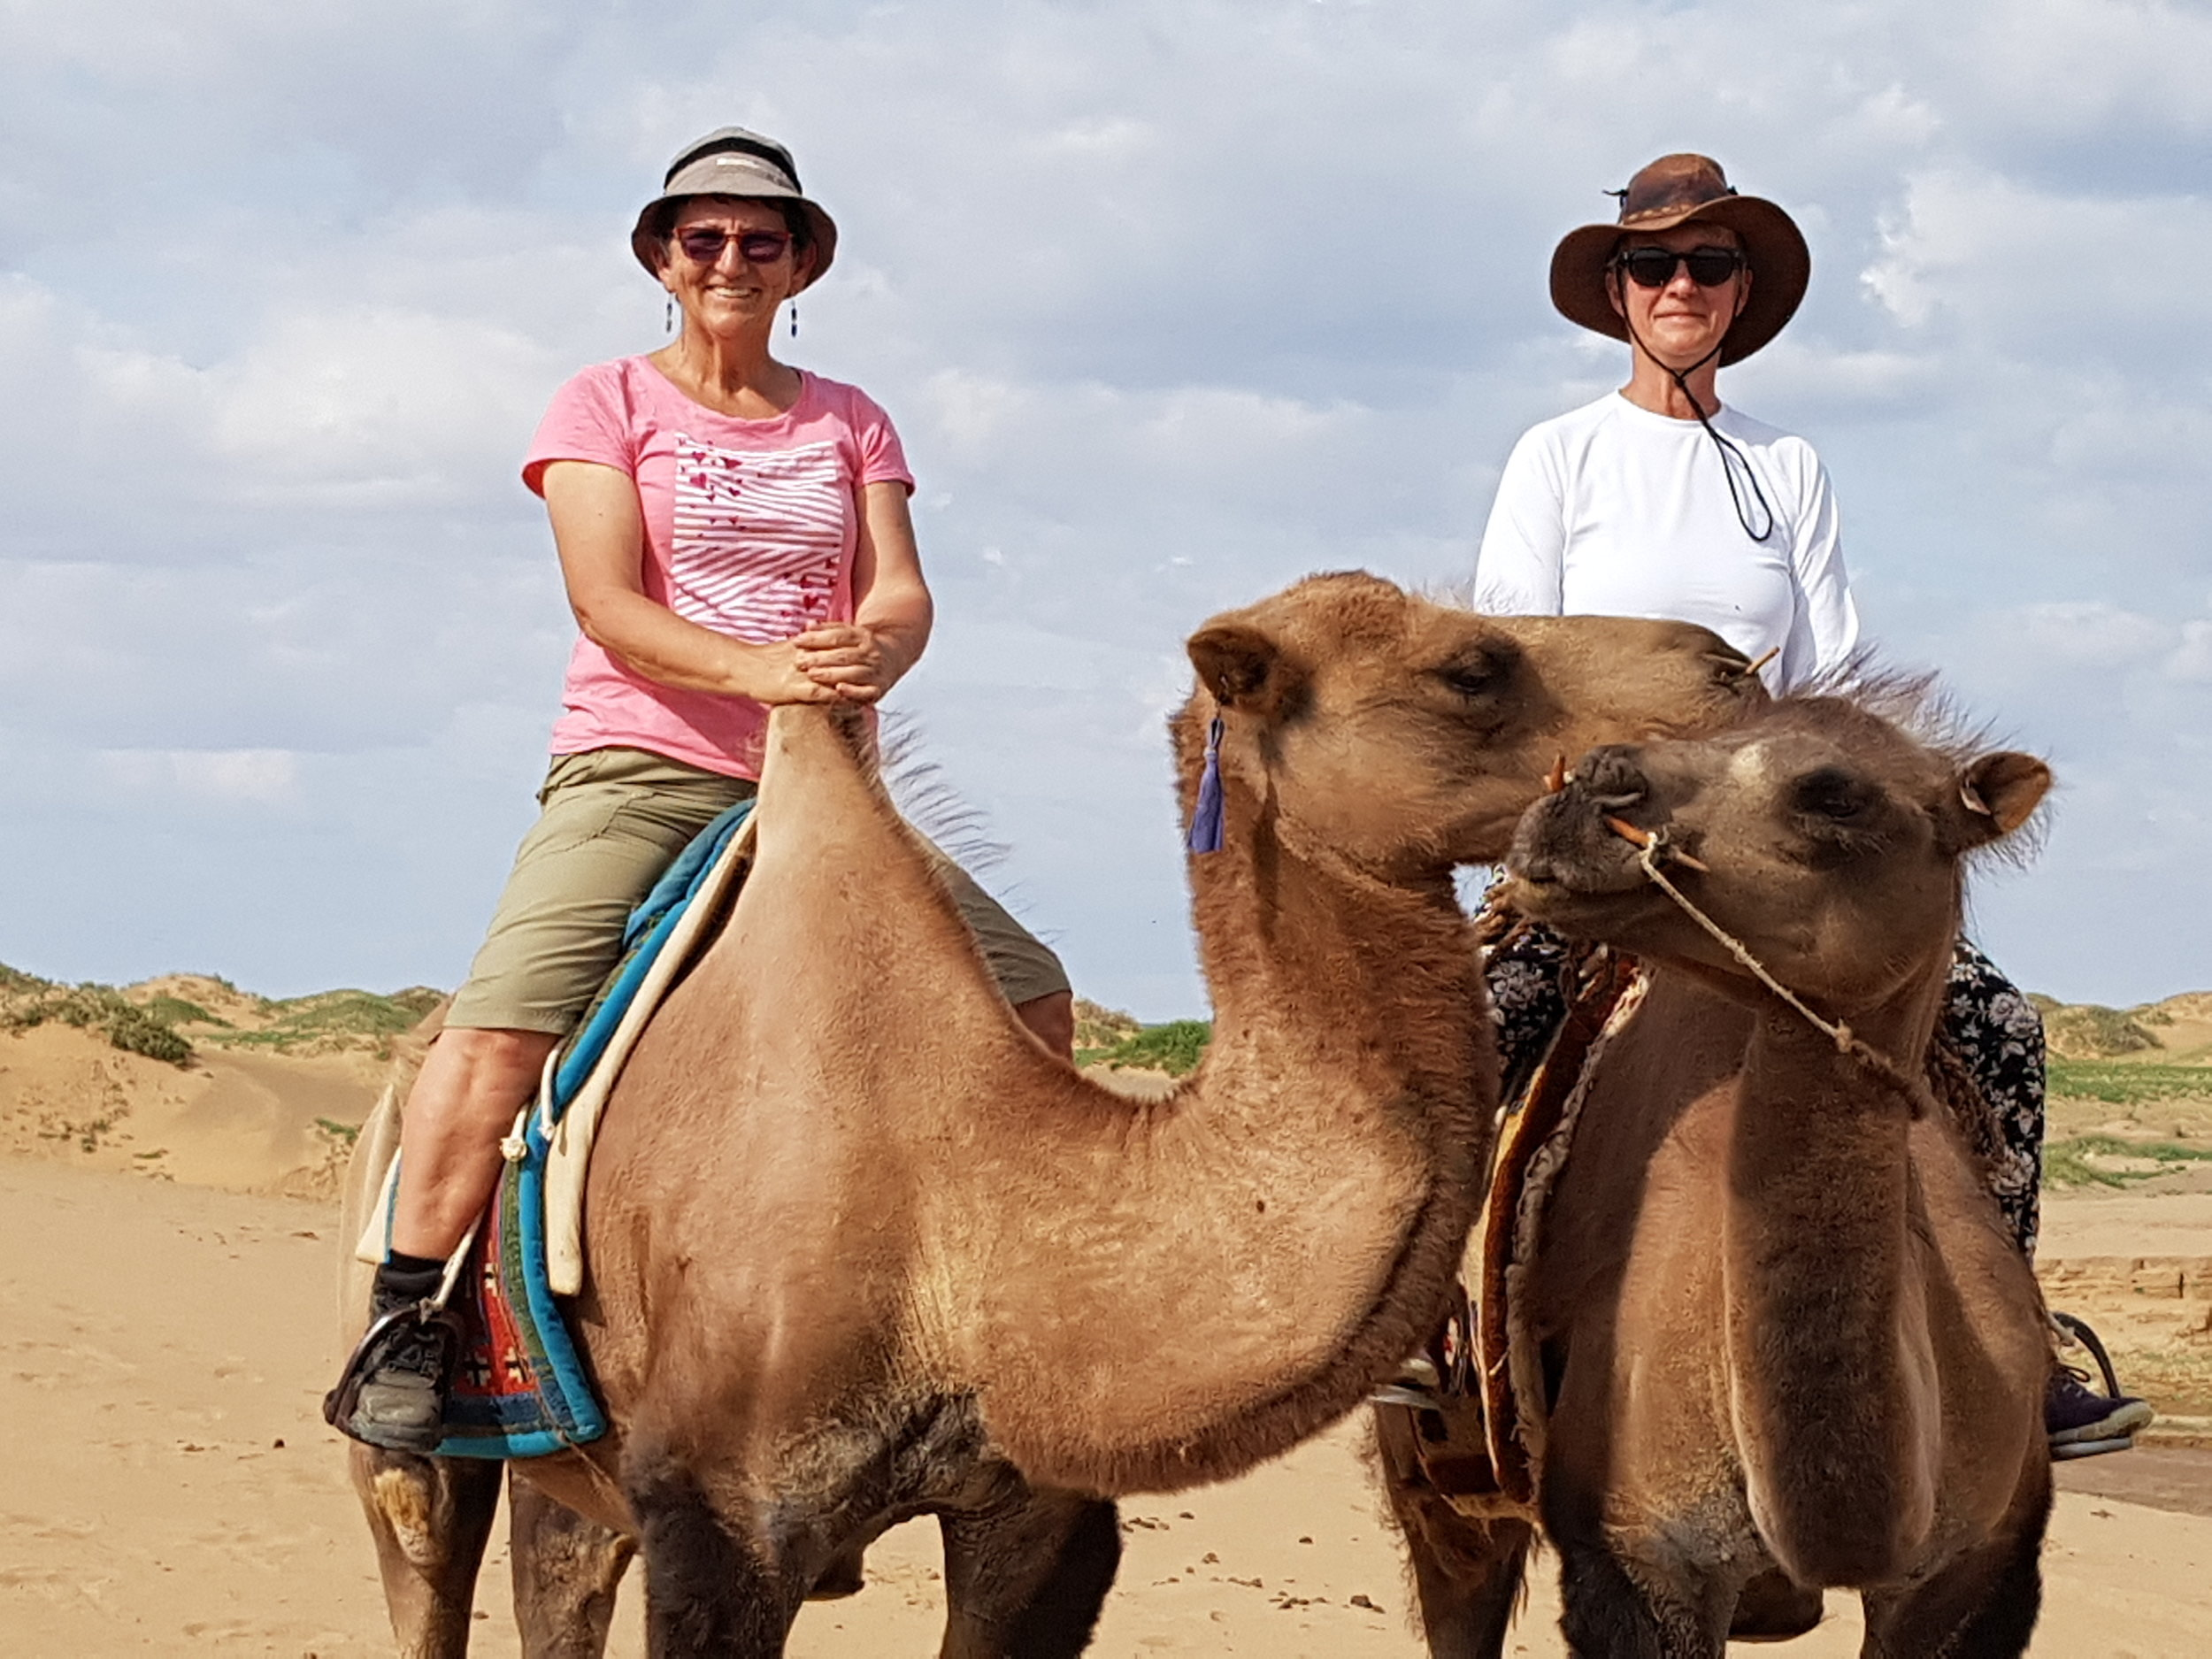 Pamela and Francien riding on Bactrian camels